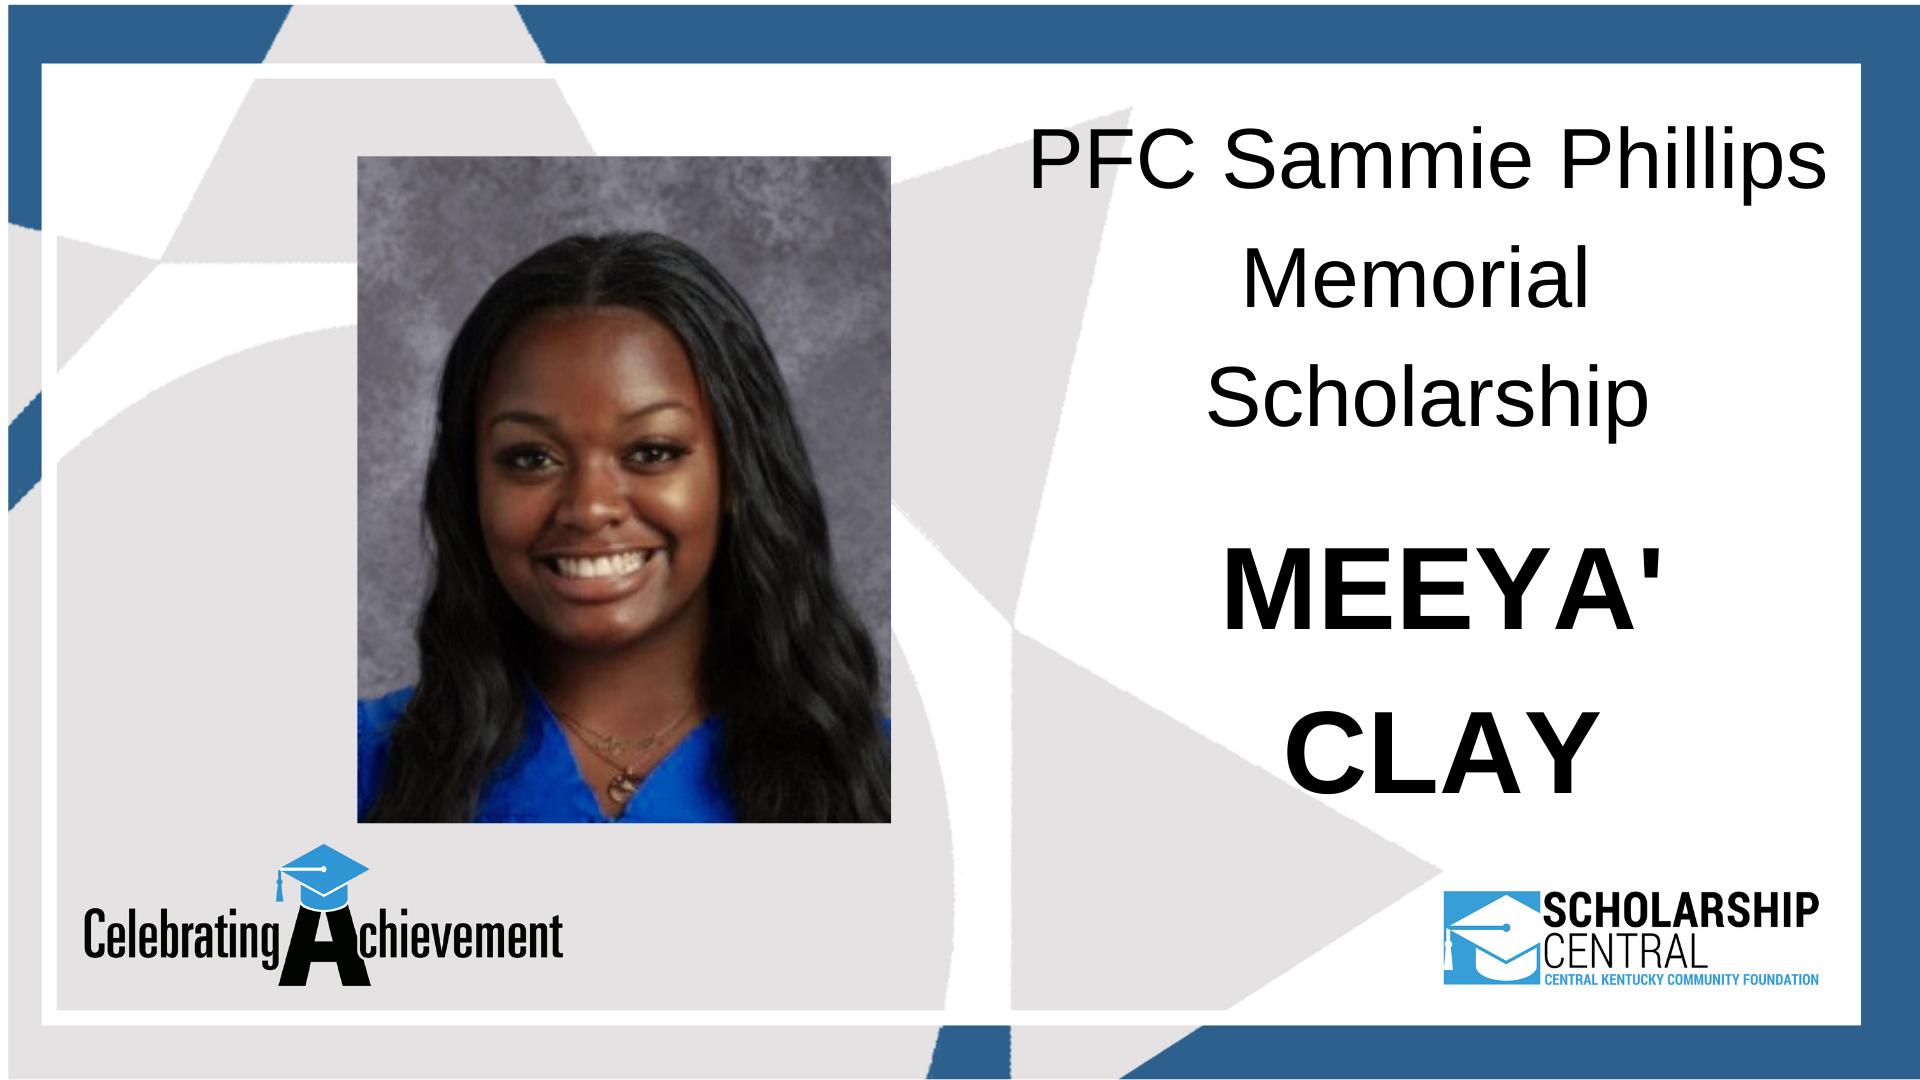 PFC Sammie Phillips Scholarship